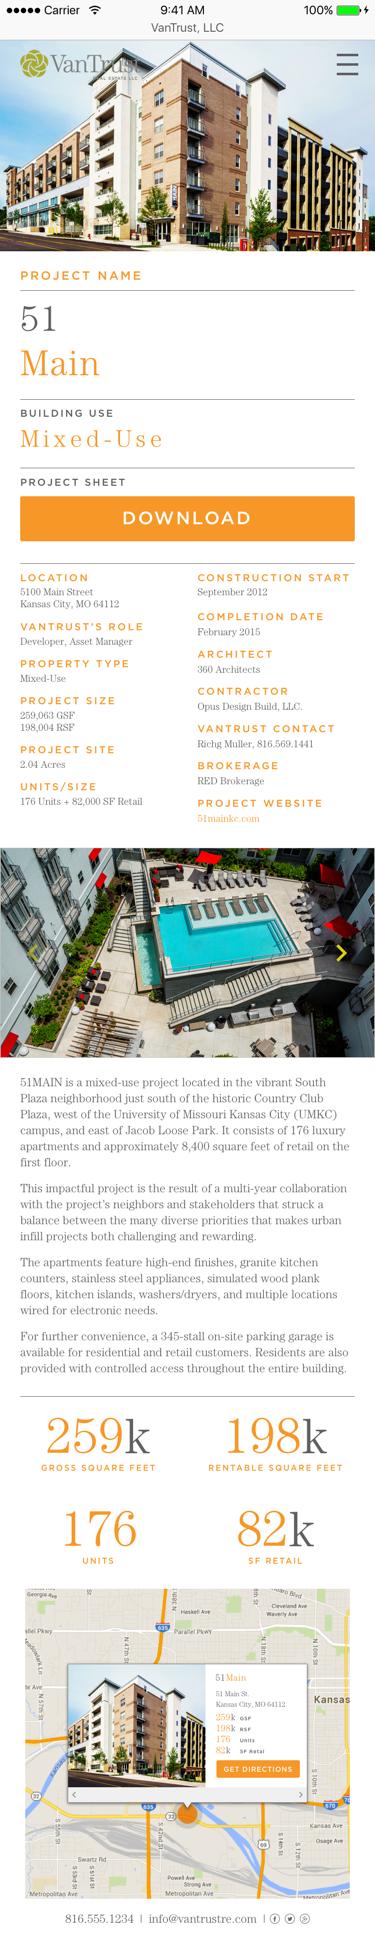 VanTrust Real Estate - Property Profile, Mobile